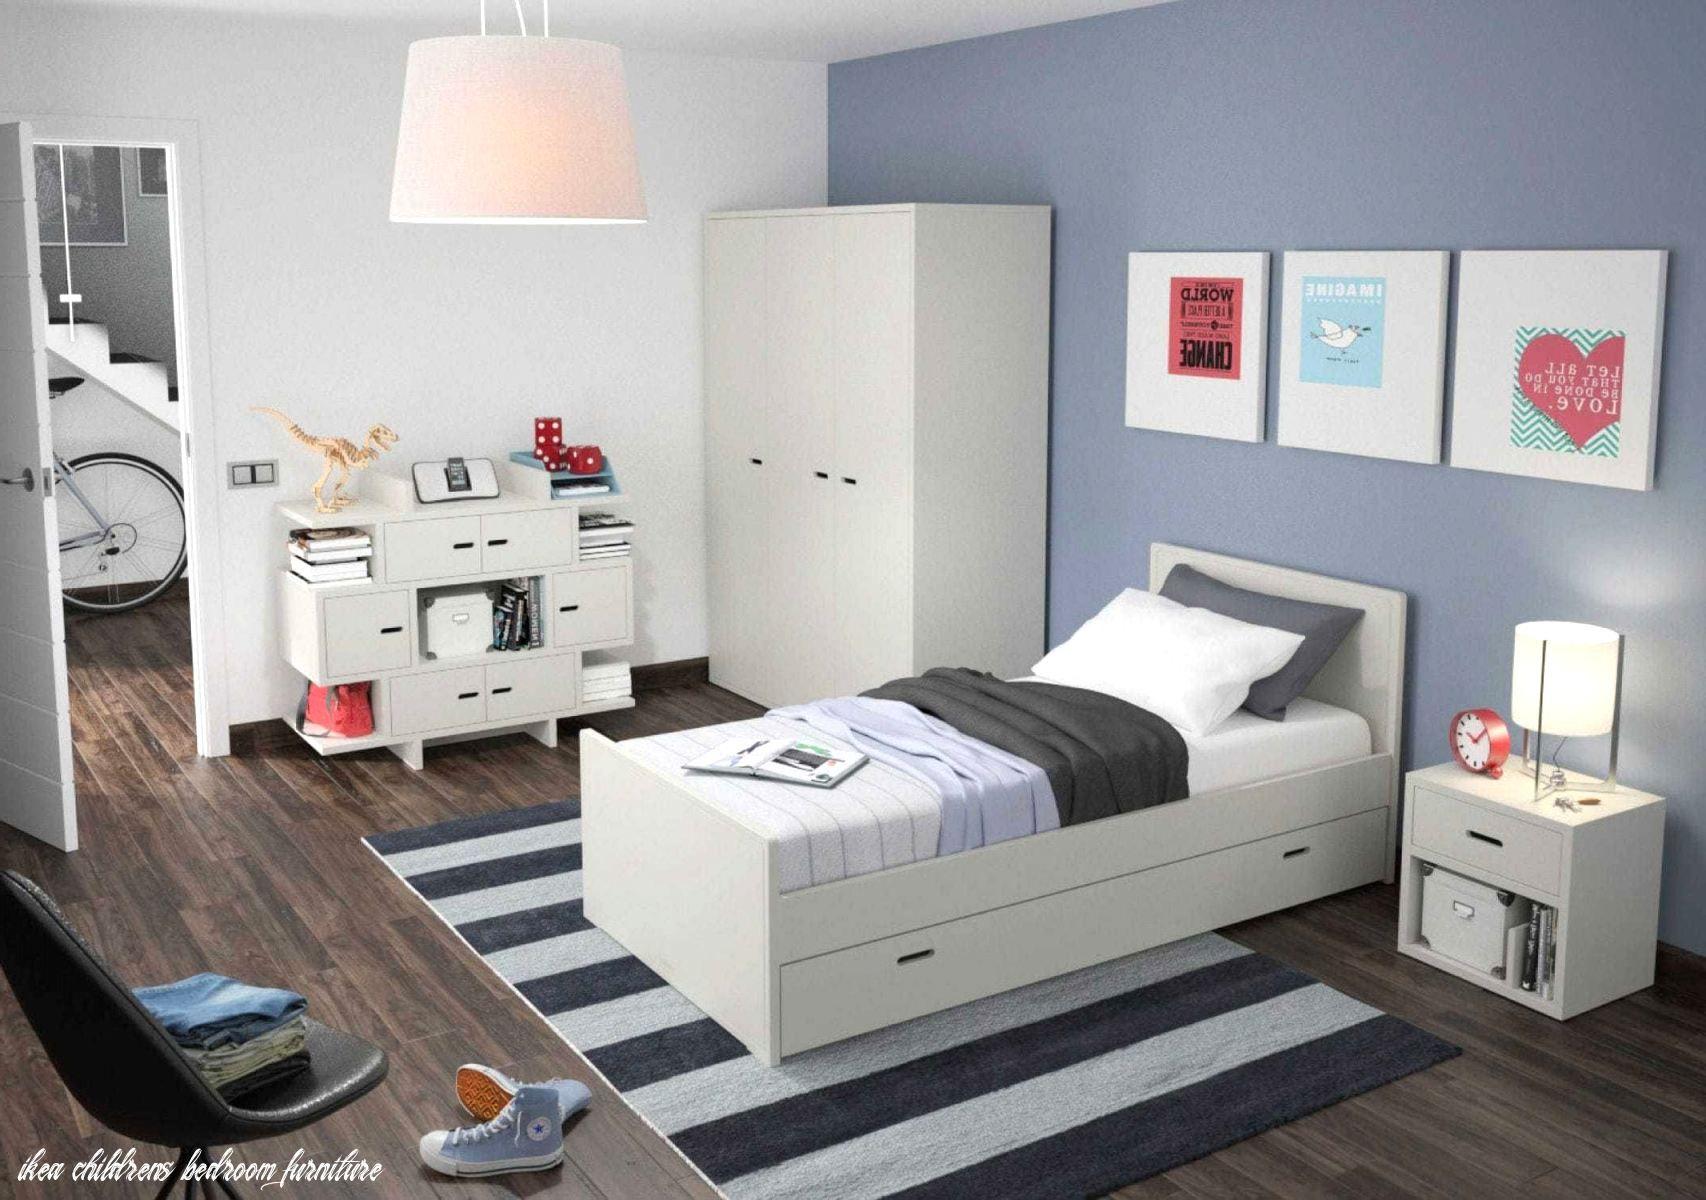 17+ Childrens bedroom furniture homebase formasi cpns